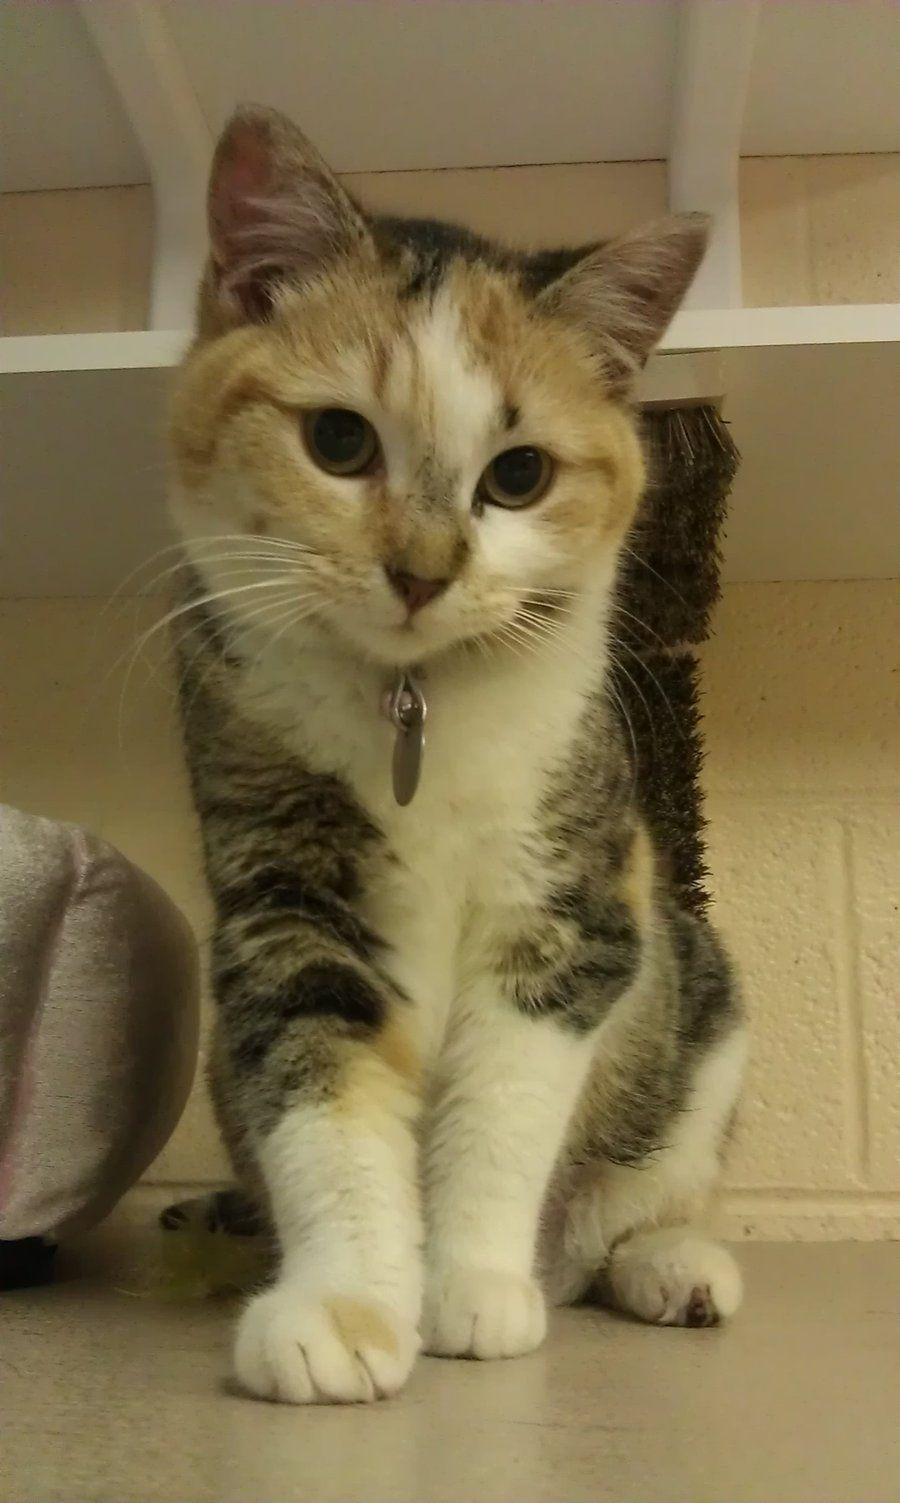 Pearl By Thatonecatnamedsuki Deviantart Com On Deviantart Kittens Cutest I Love Cats Calico Cat